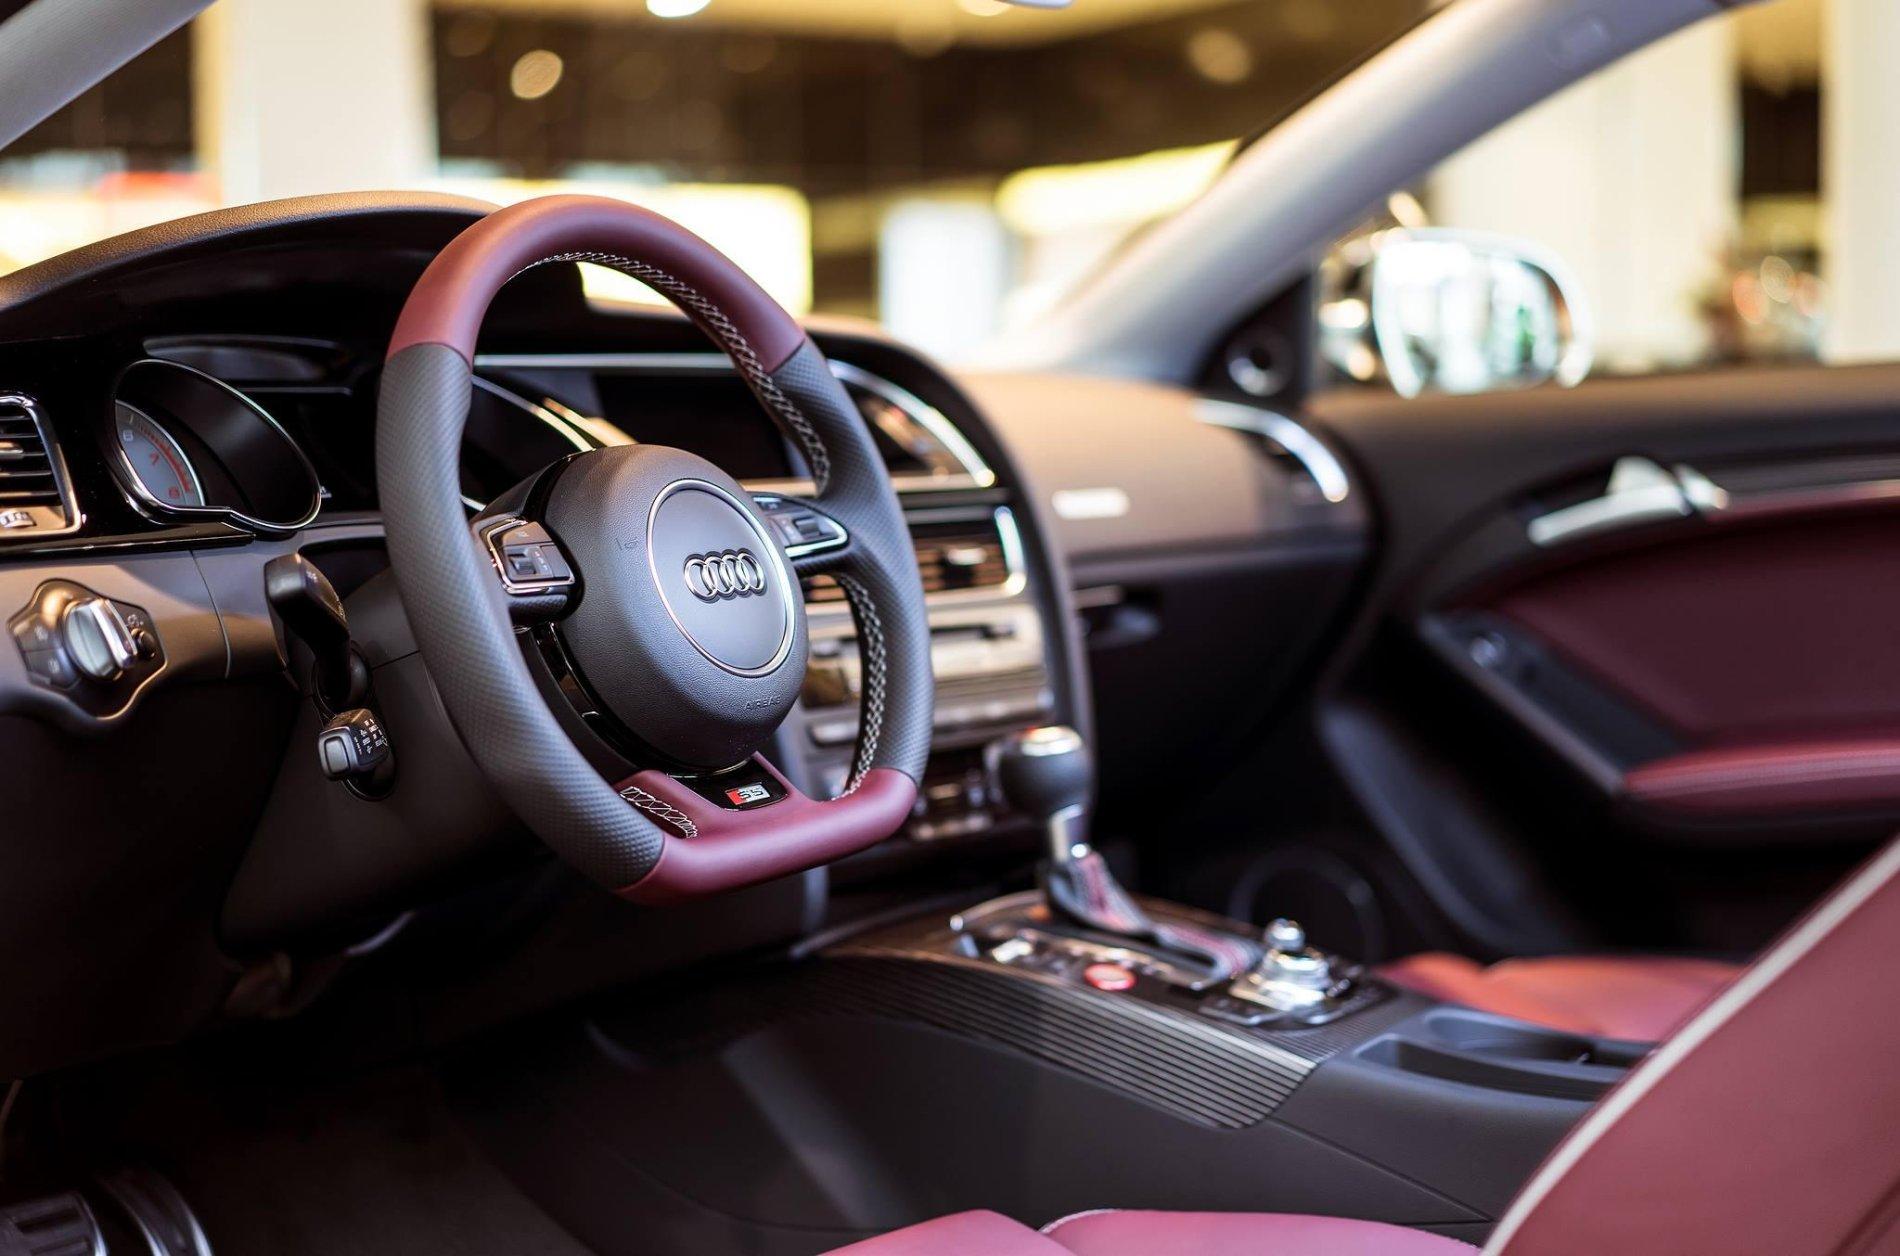 Audi S5 in Mahogany Mica - Audi S5 in Mahogany Mica